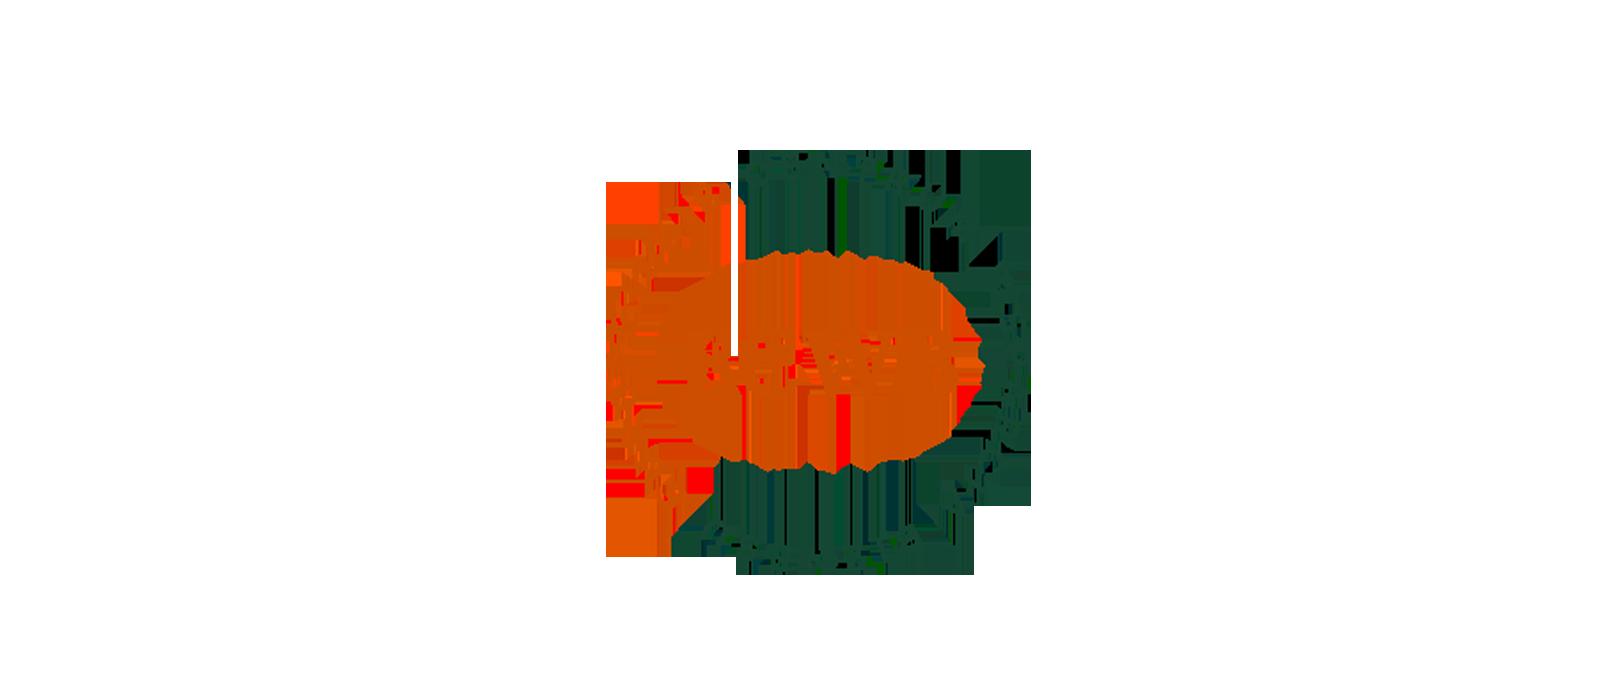 https://ecwb.pl/wp-content/uploads/2021/06/tlo-glowna-ecwb.png